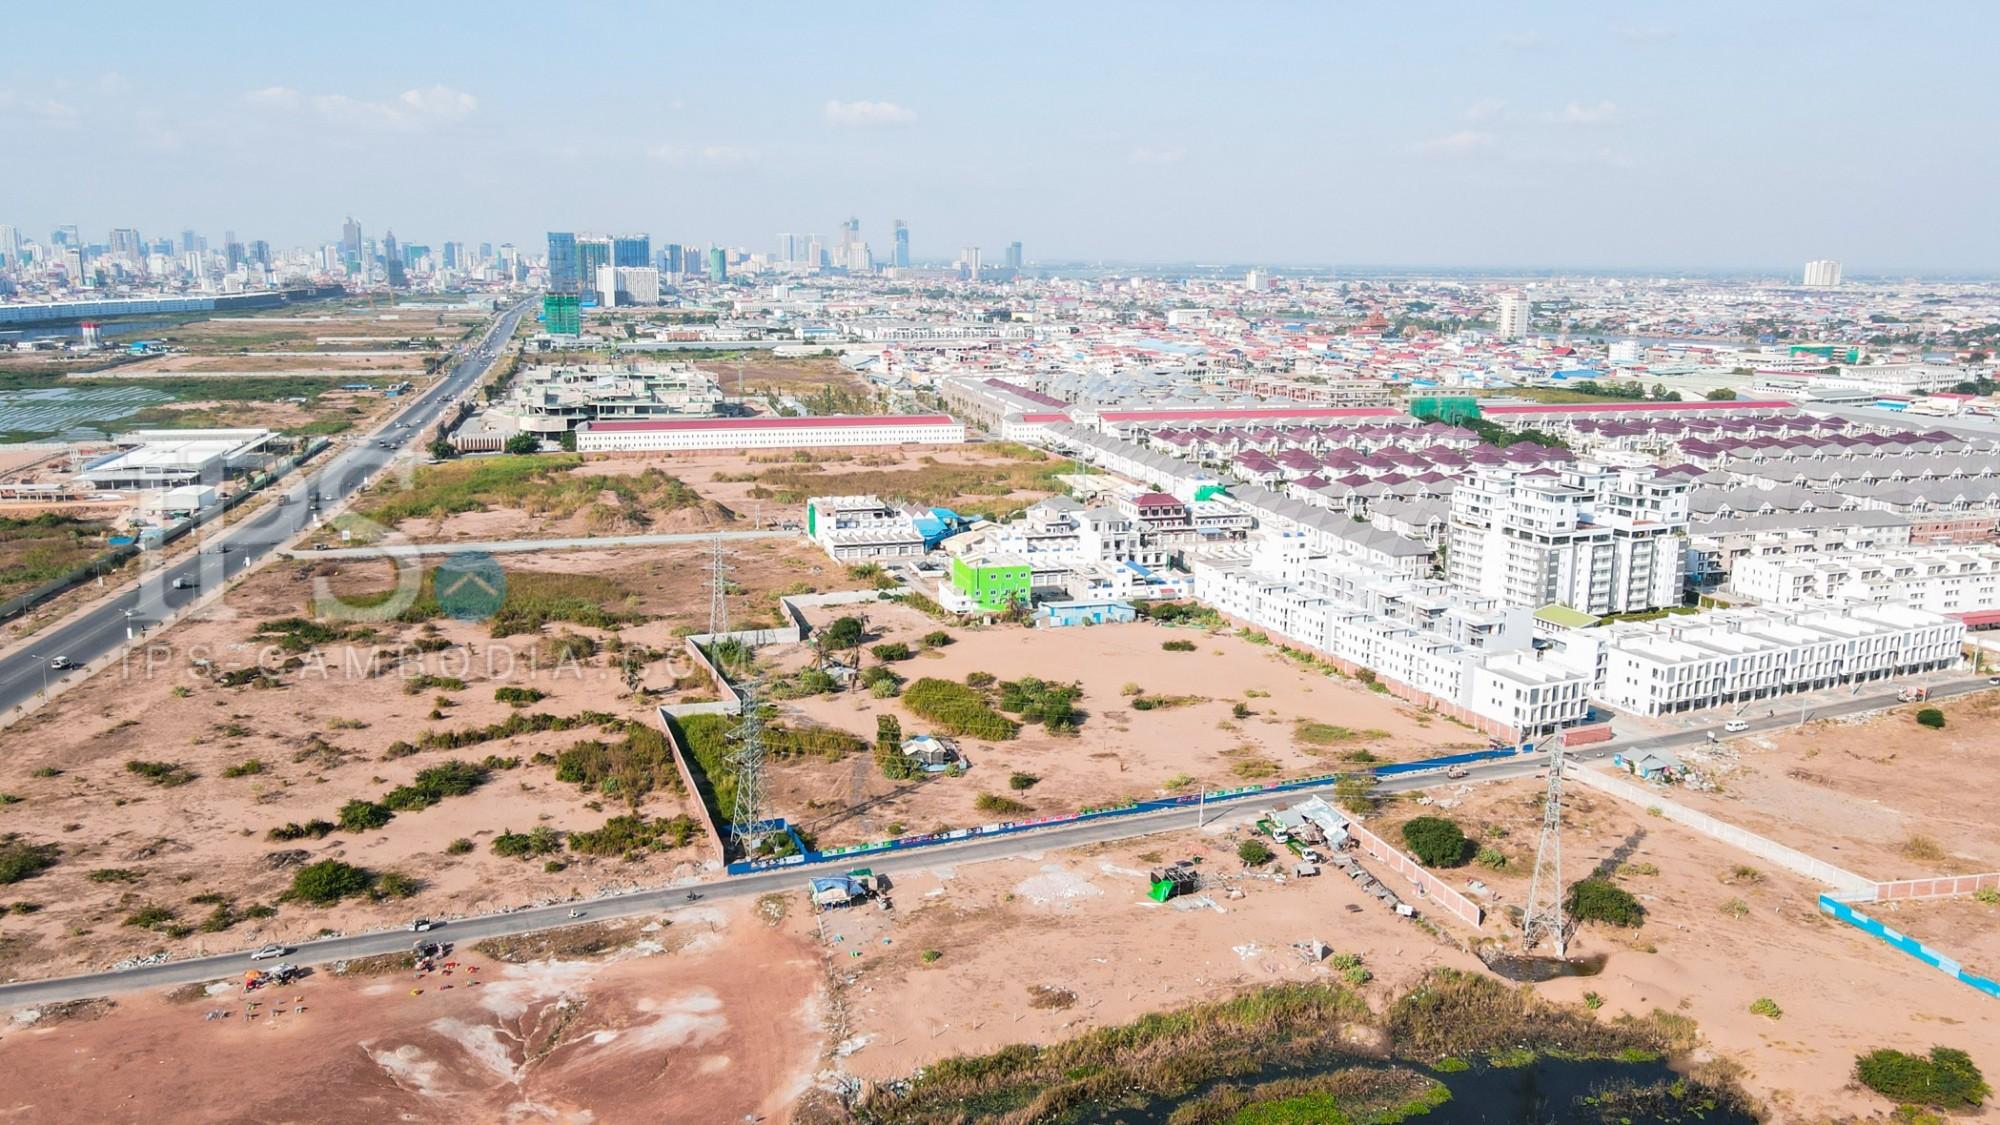 9000 Sqm Land For Lease - Hun Sen Blvd, Phnom Penh